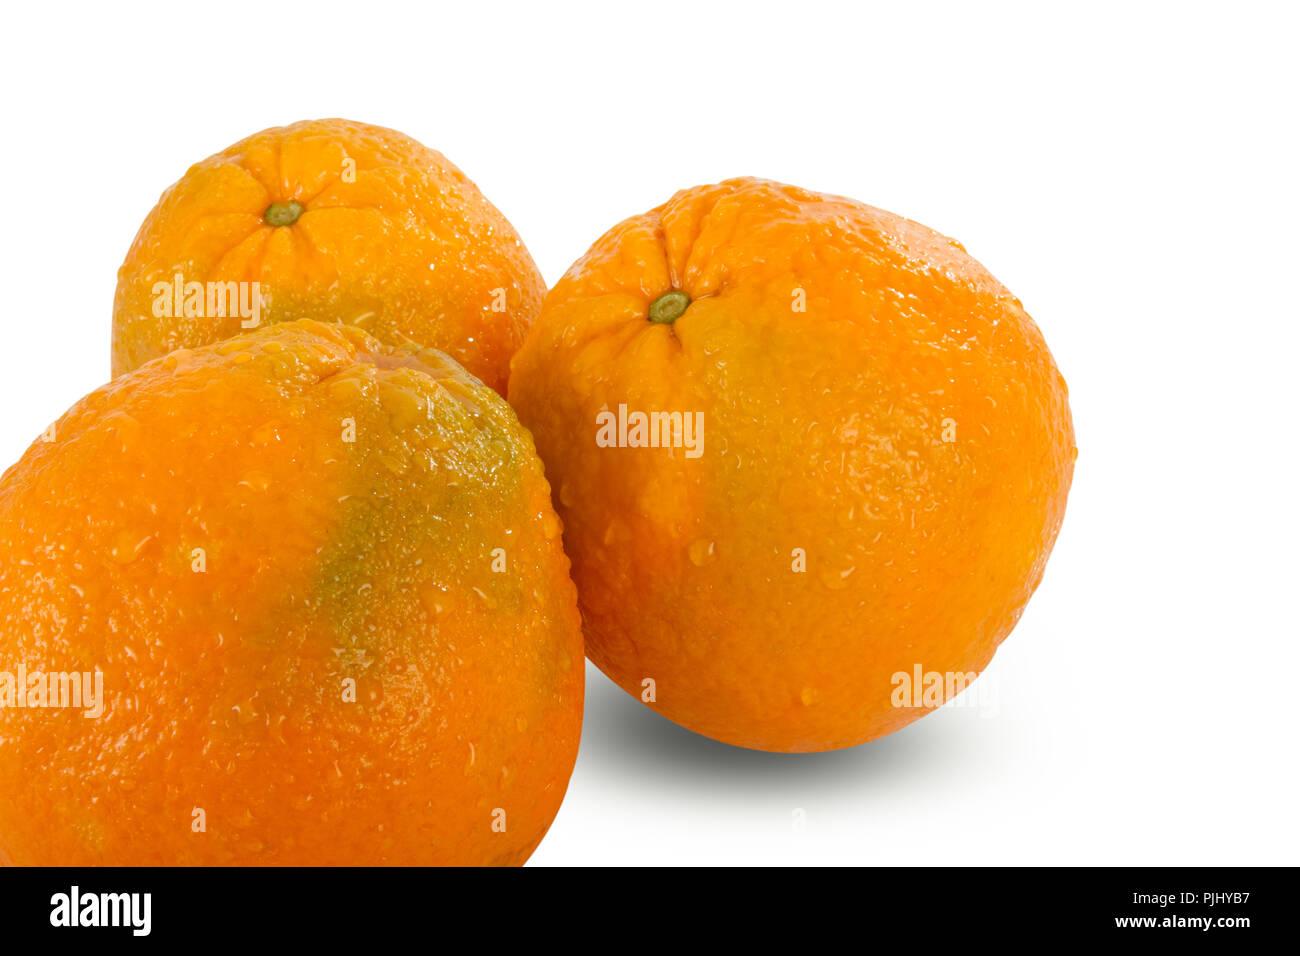 Fresh harvest juicy oranges isolated on white background. Nutrition and heathcare concept. - Stock Image